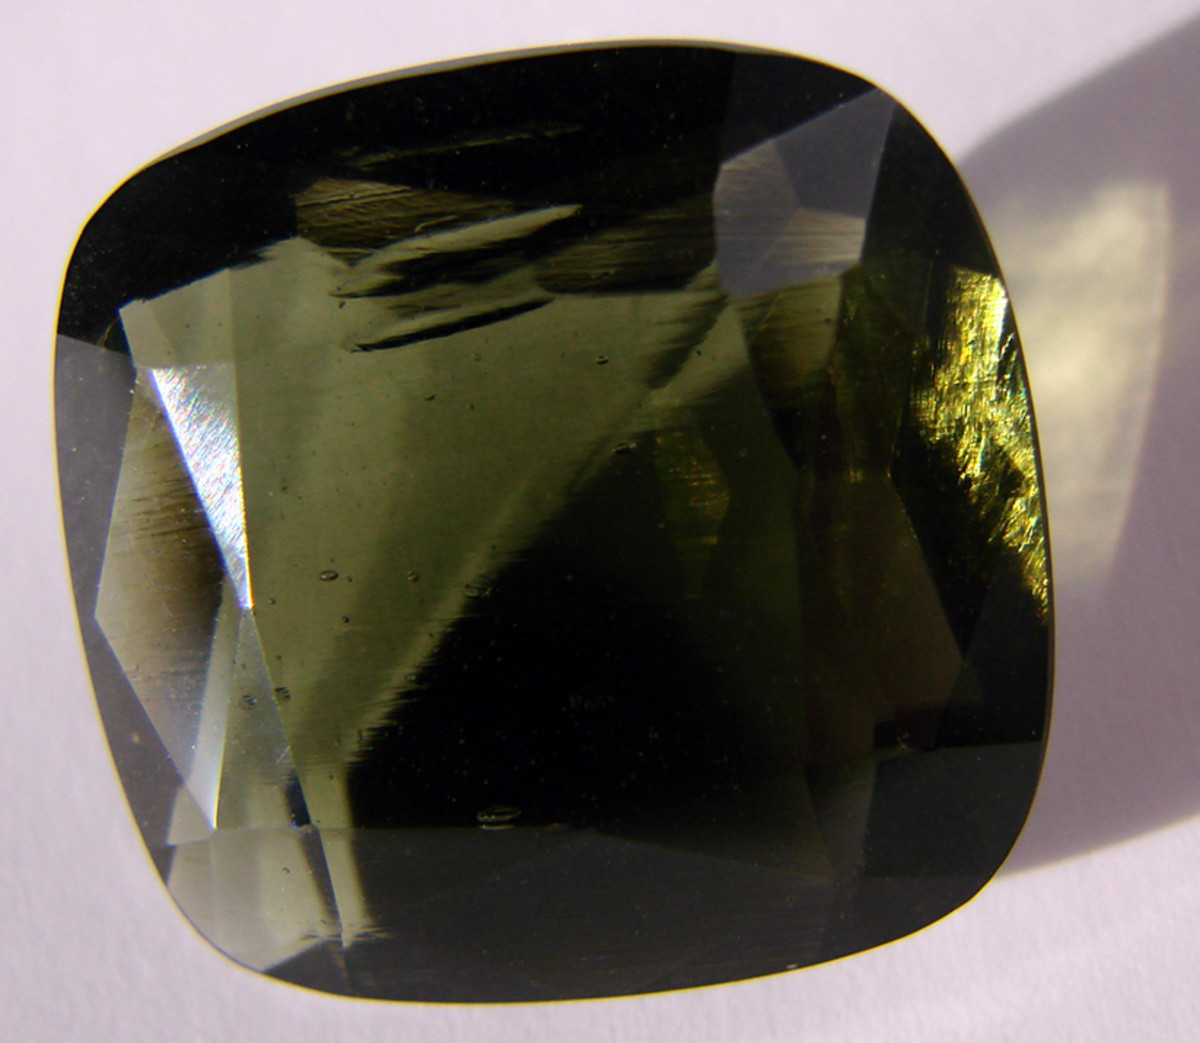 Spiritual and Healing Properties of Moldavite, the Otherworldly Stone